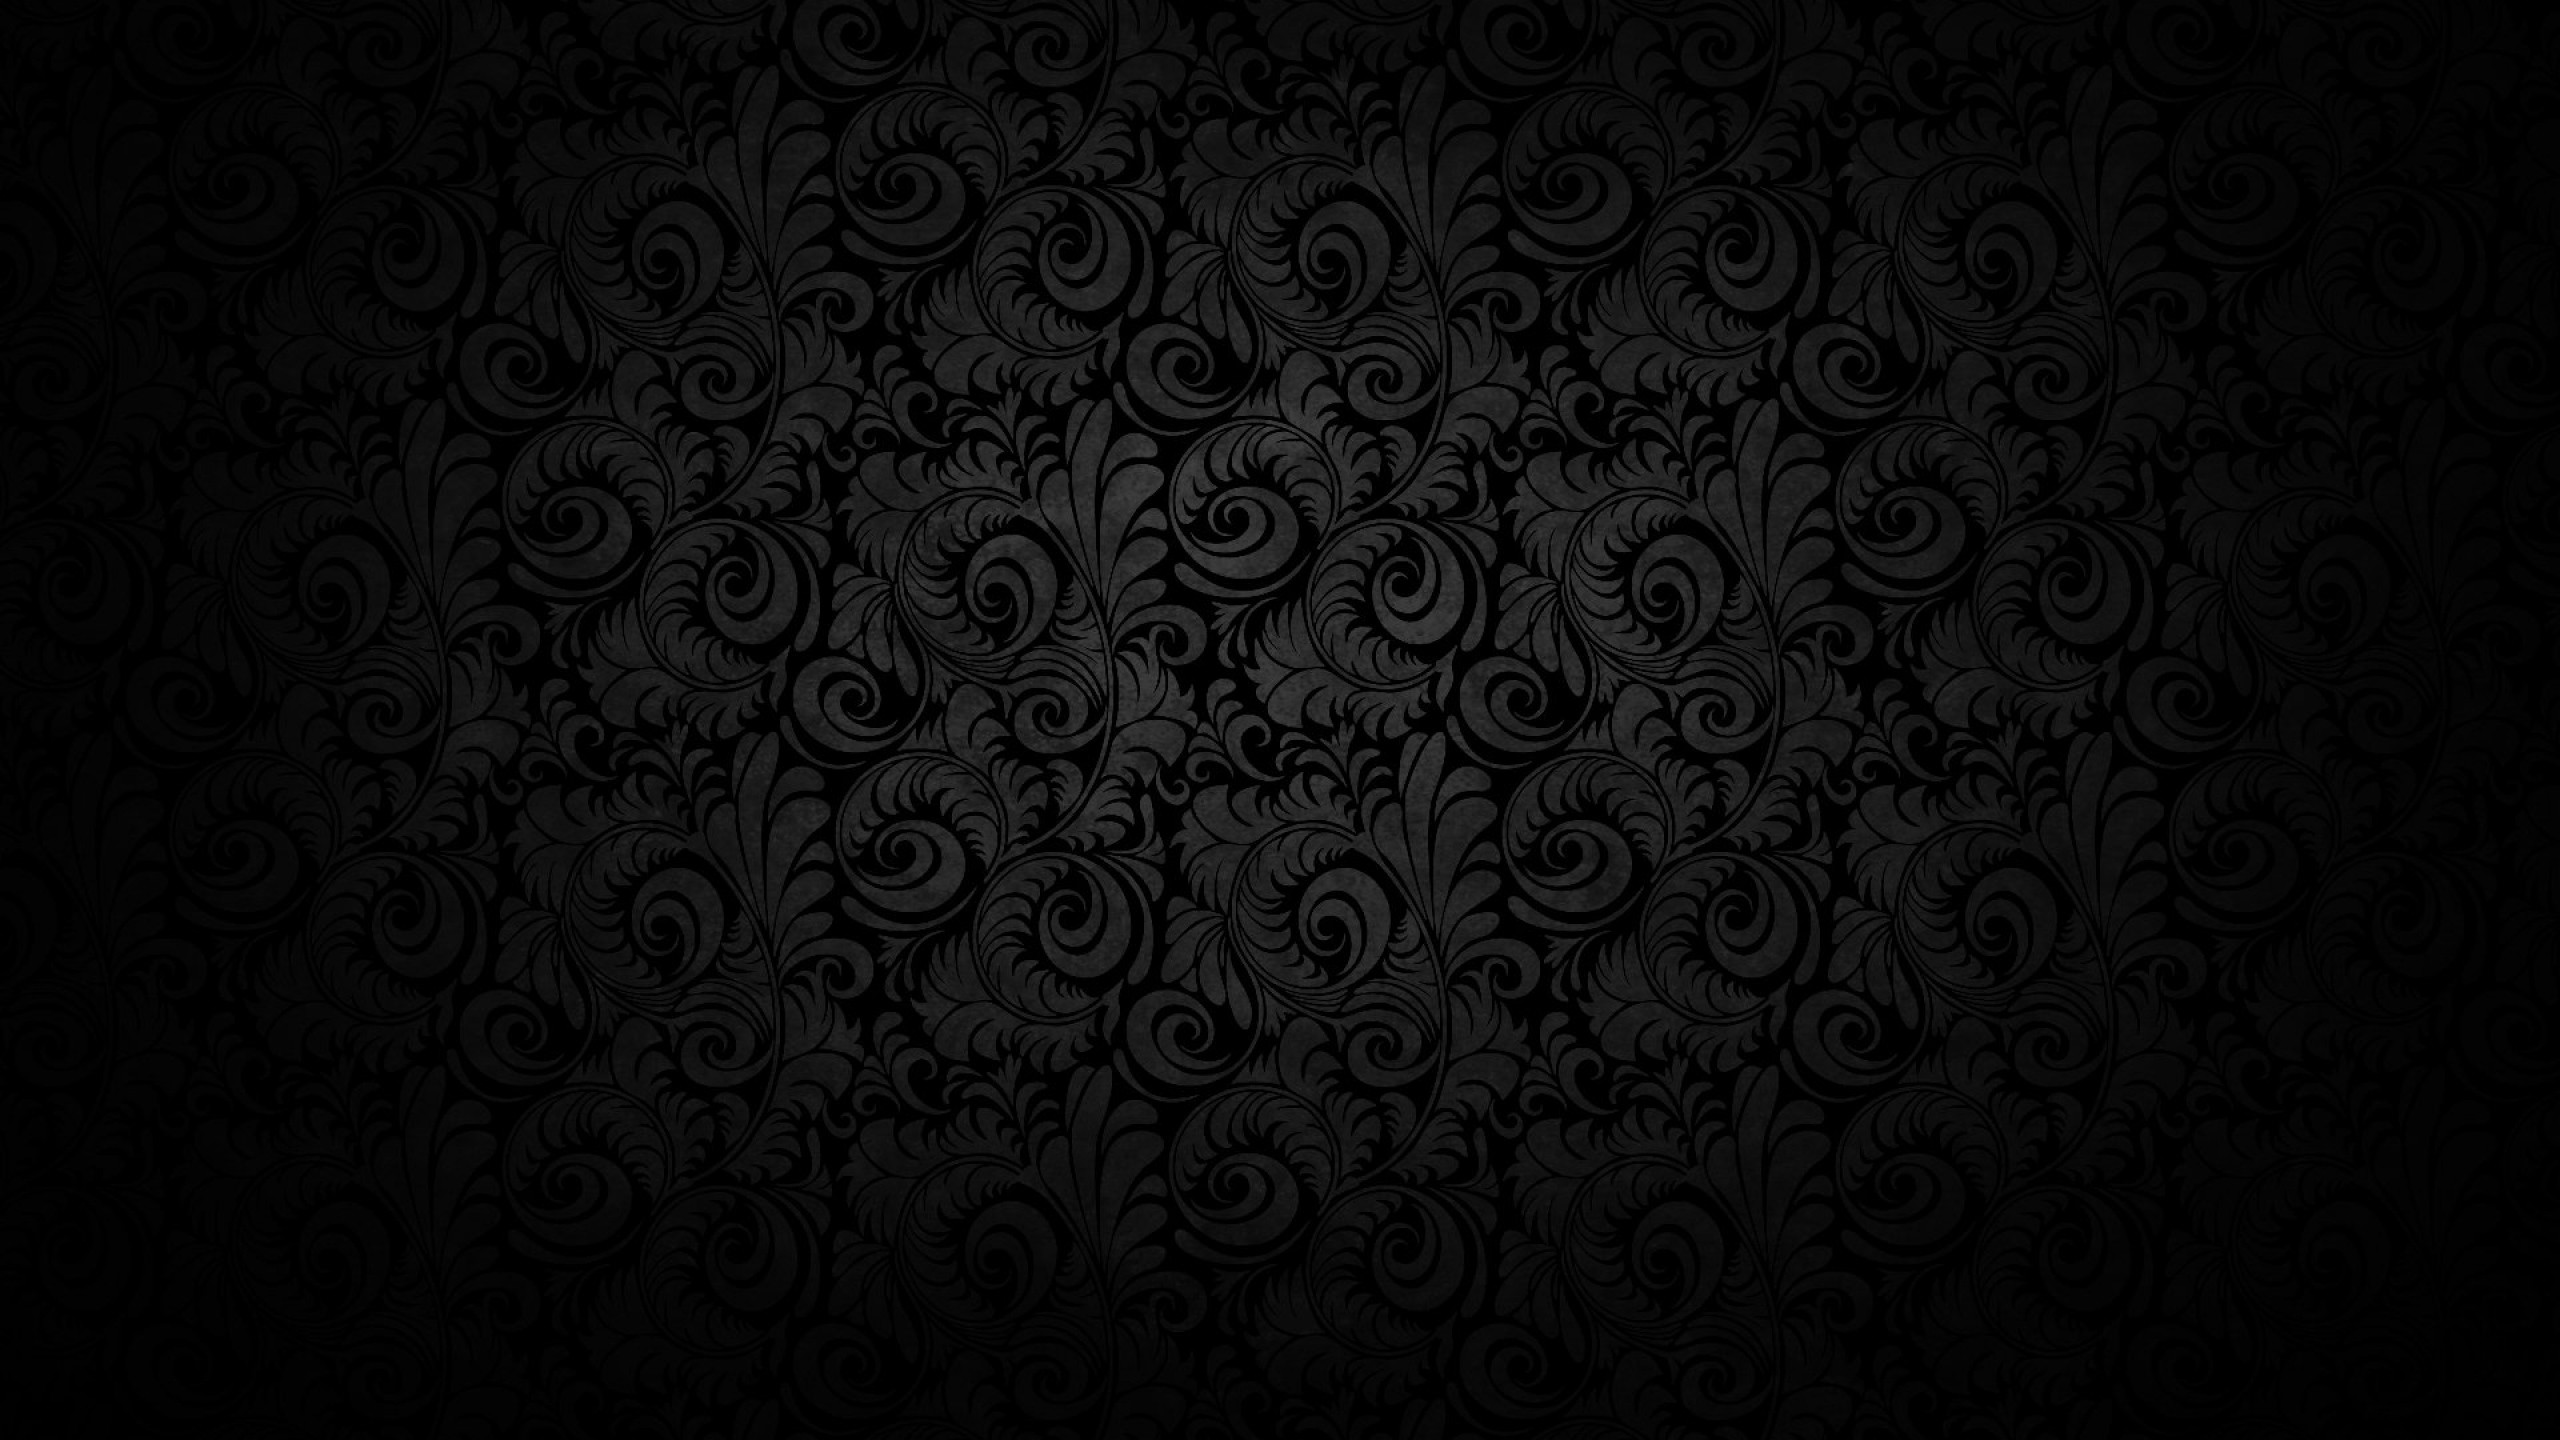 2560x1440 background wallpaper: 2560x1440 Black Wallpaper (84+ Images